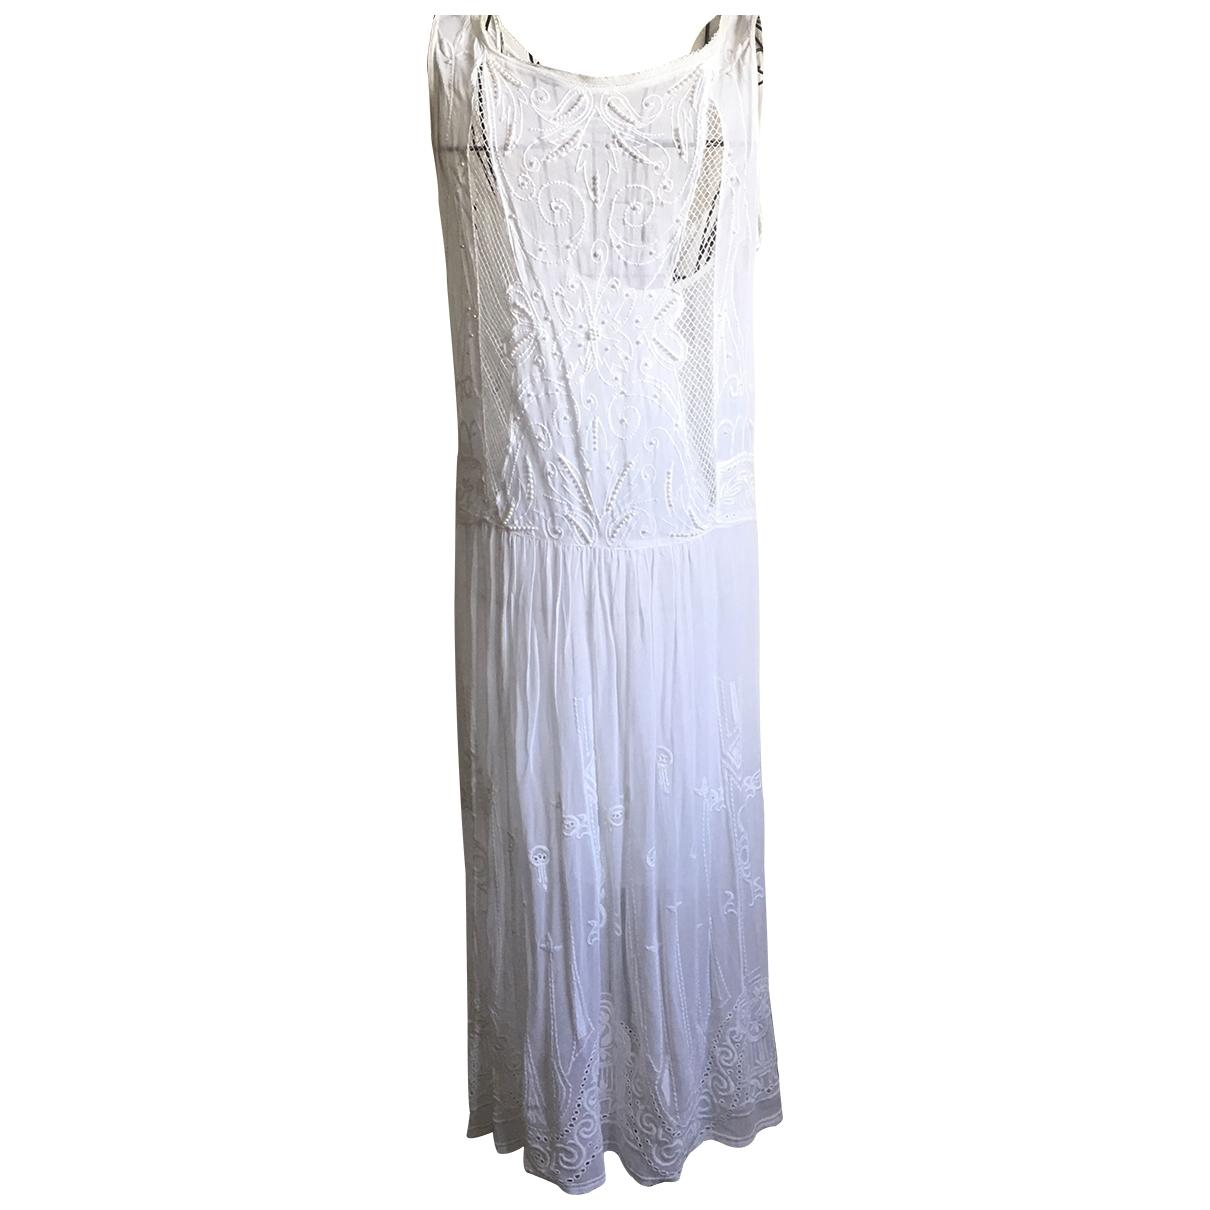 Zara \N Kleid in  Weiss Baumwolle